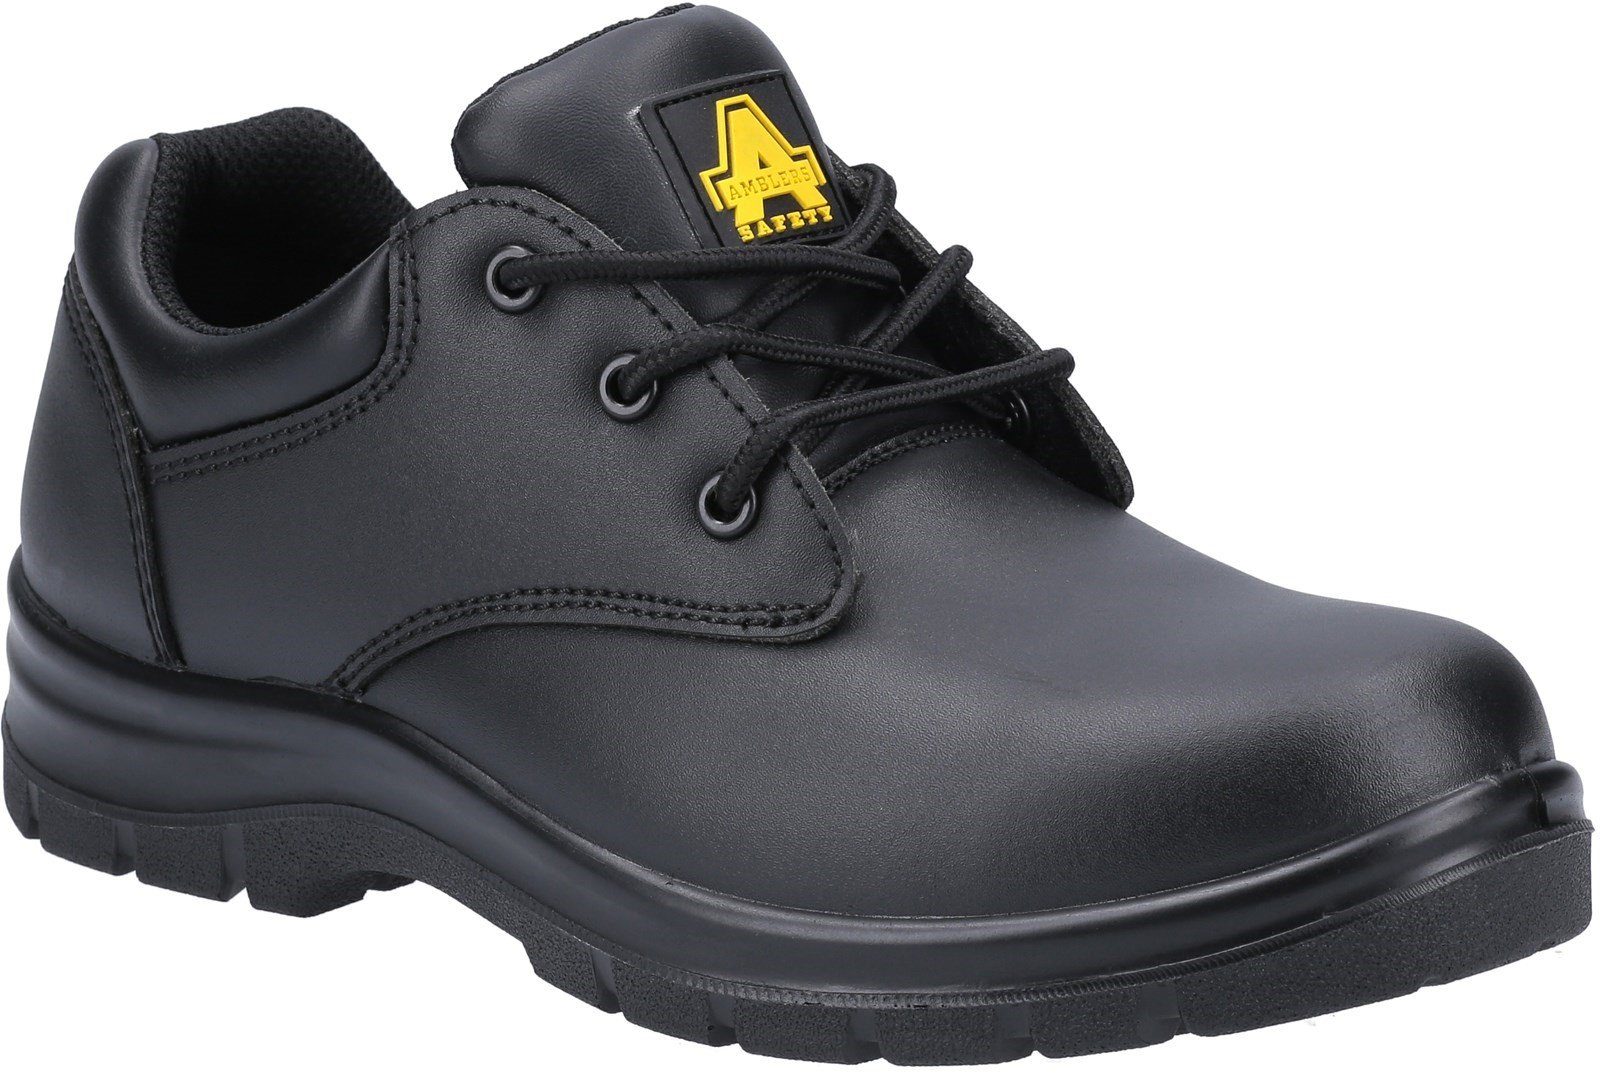 Amblers Women's Safety Boot Black 31370 - Black 3